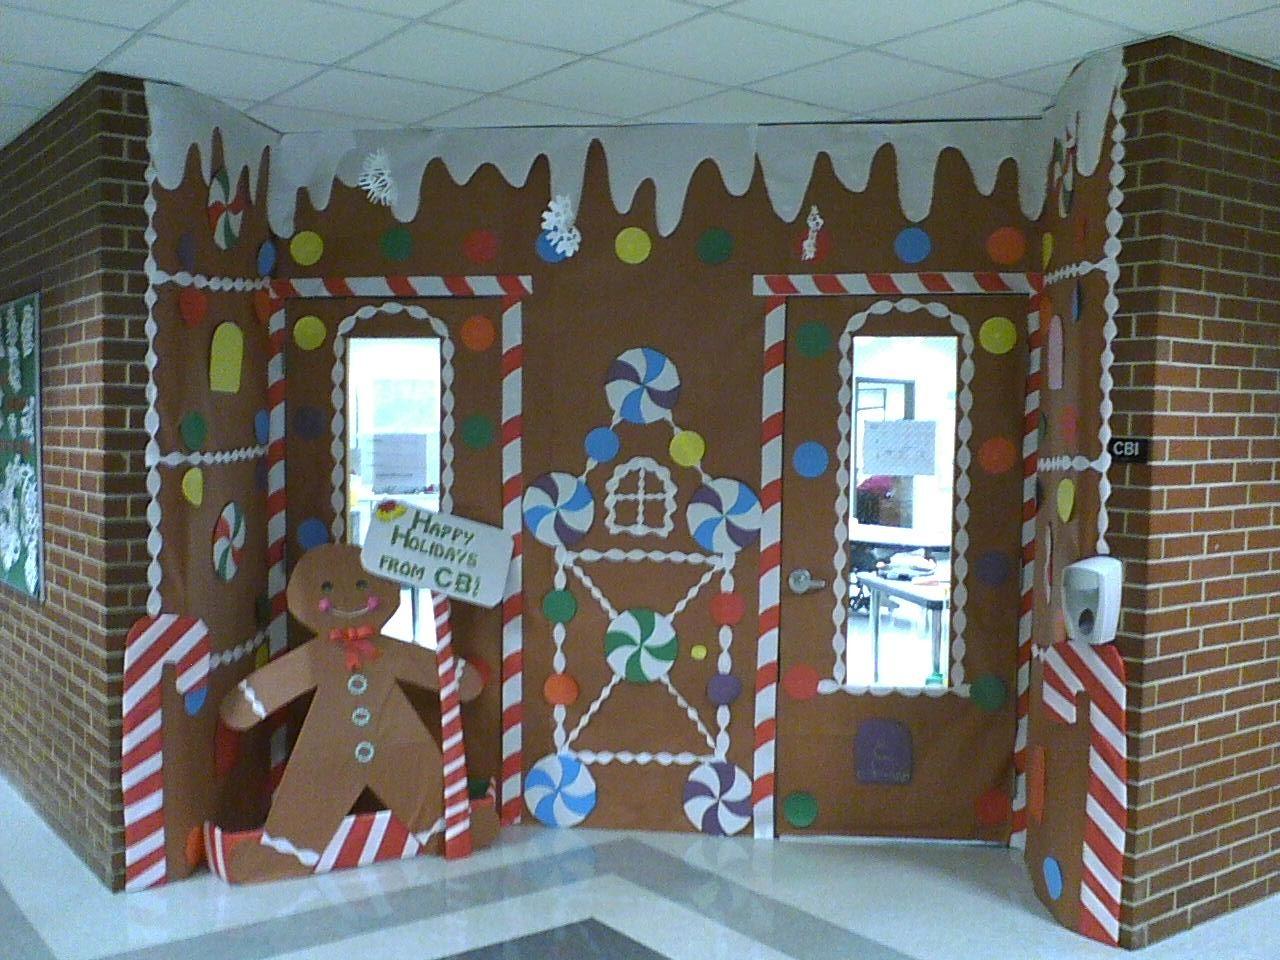 100+ [ Classroom Door Christmas Decorations Ideas ] : Your A Mean One Mr Grinch Door Decor ...